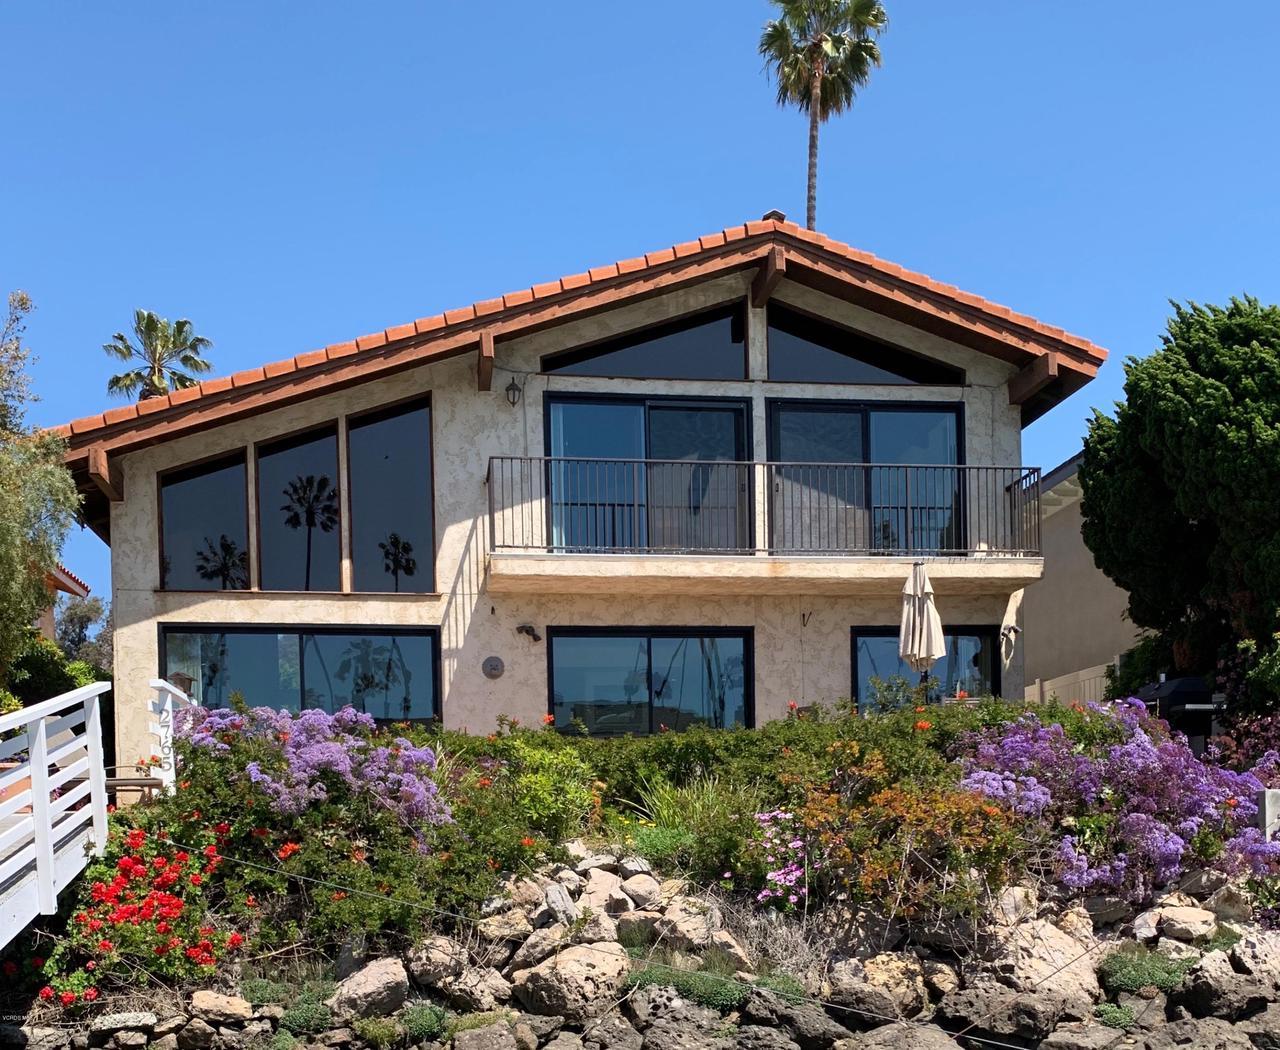 2765 SEAHORSE, Ventura, CA 93001 - Front Pic